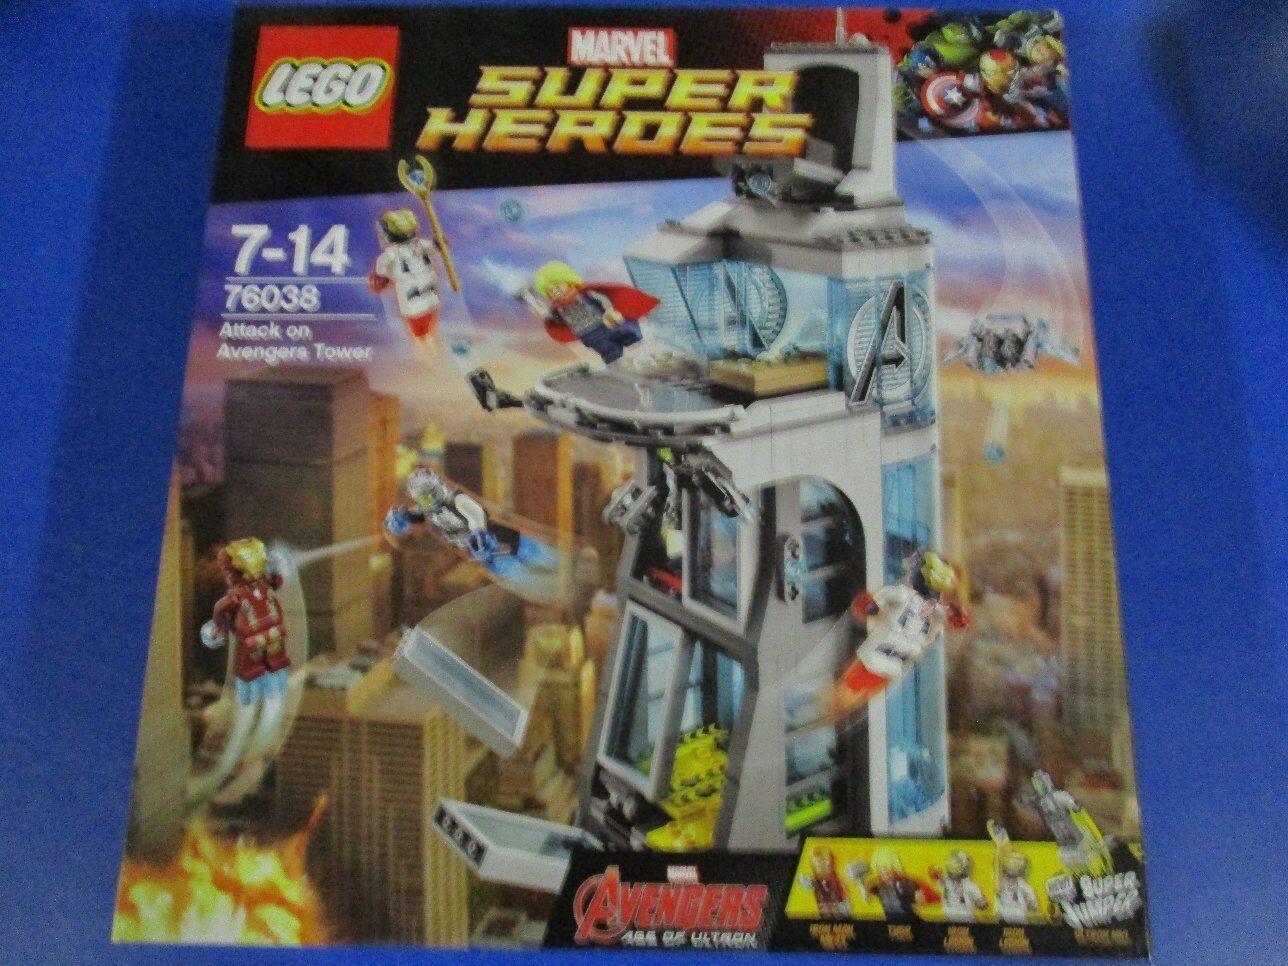 Lego Marvel Super Heroes 76038 76038 76038 Avengers número 5 nuevo embalaje original 0b7467